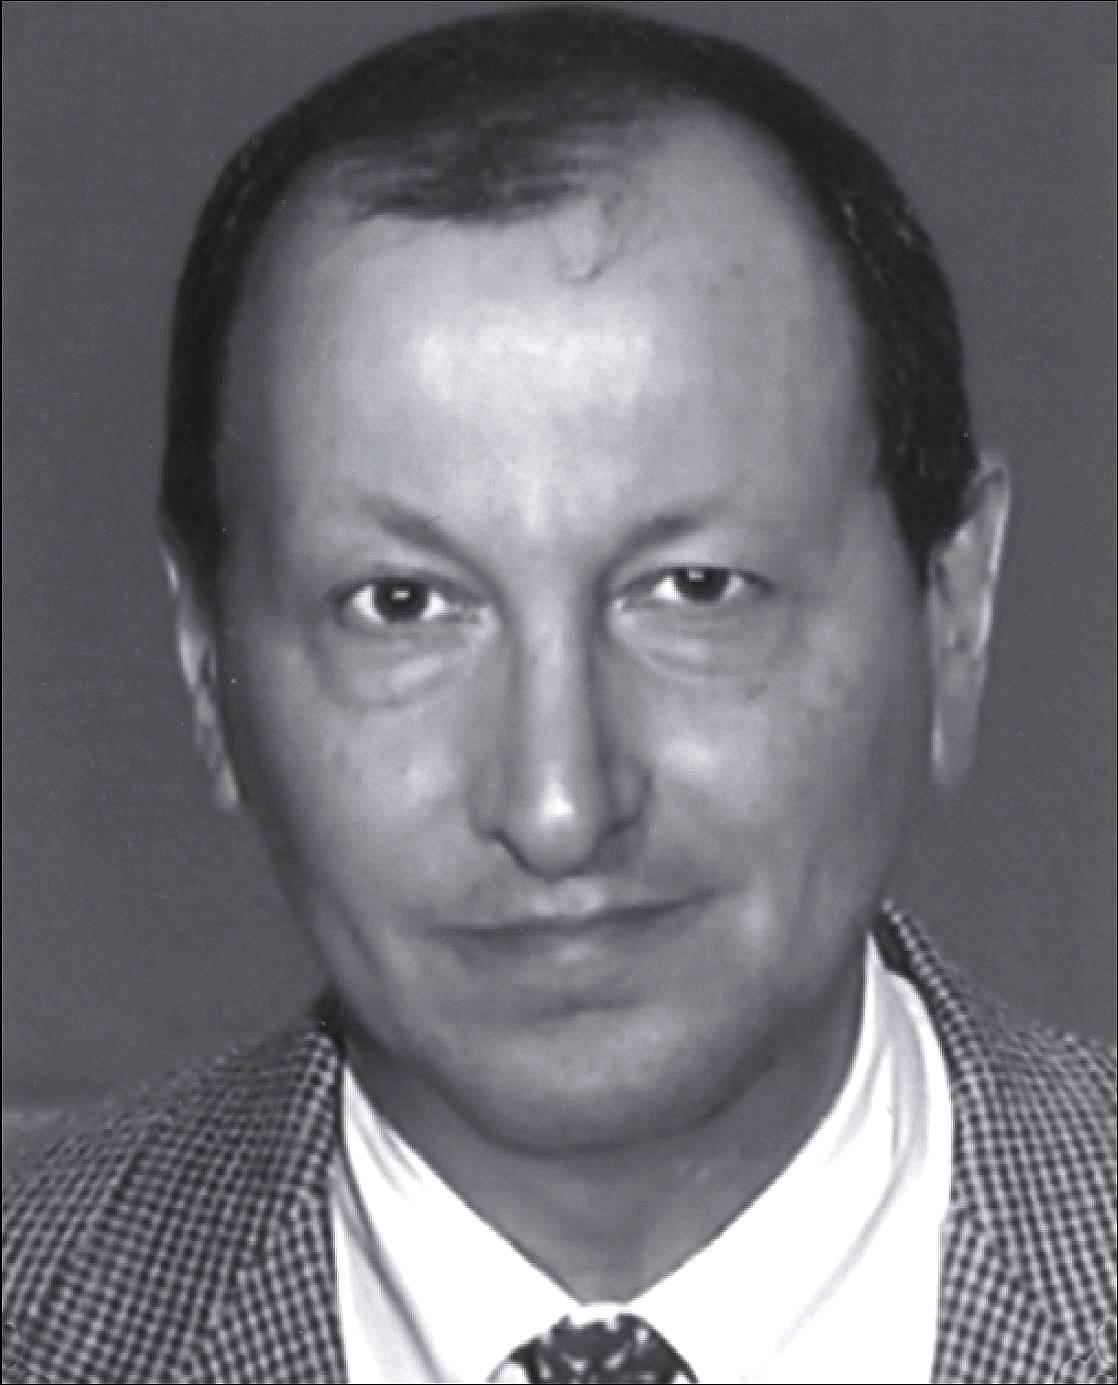 R. Steven Whalen aka Steven R. Whalen